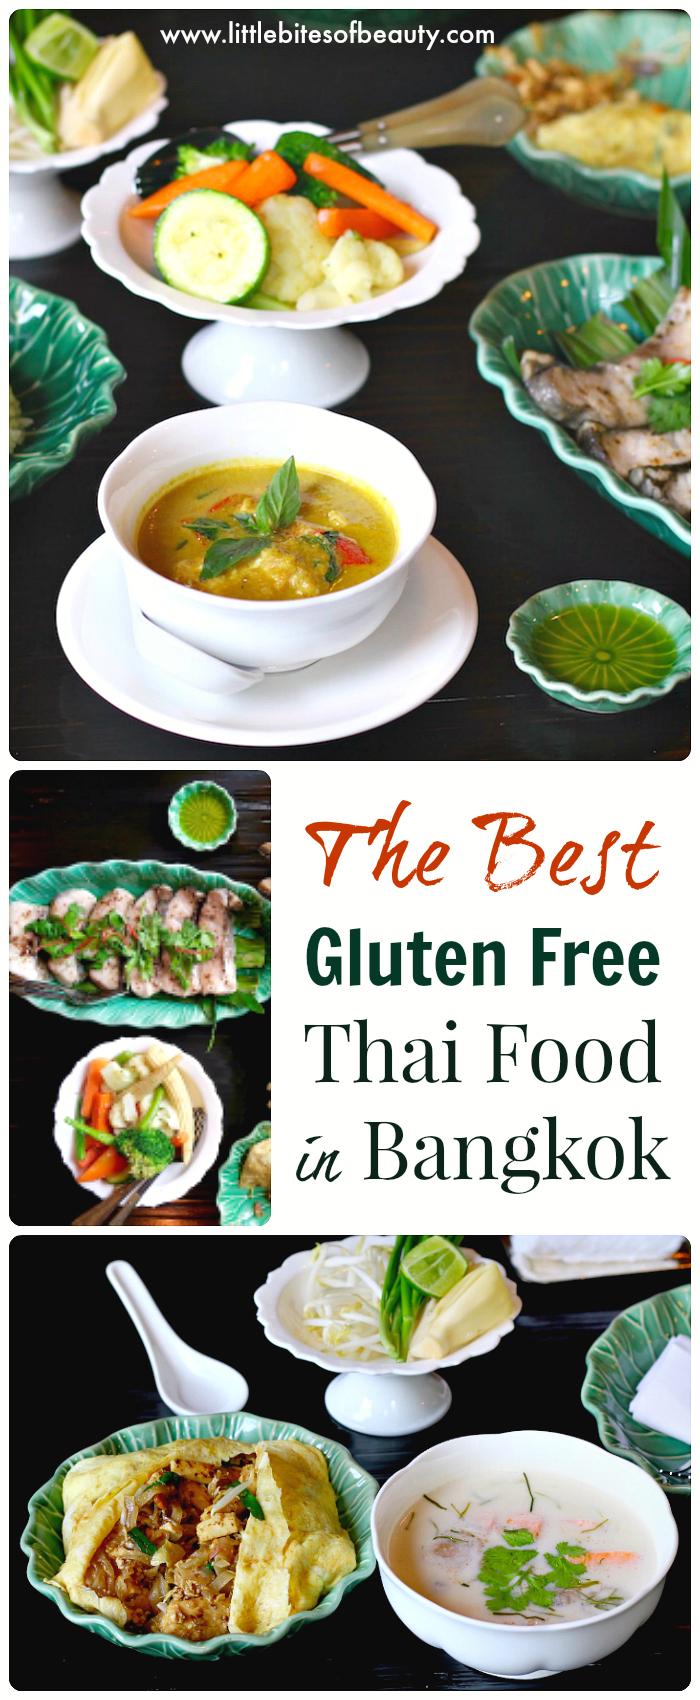 The Best Gluten Free Thai Food in Bangkok